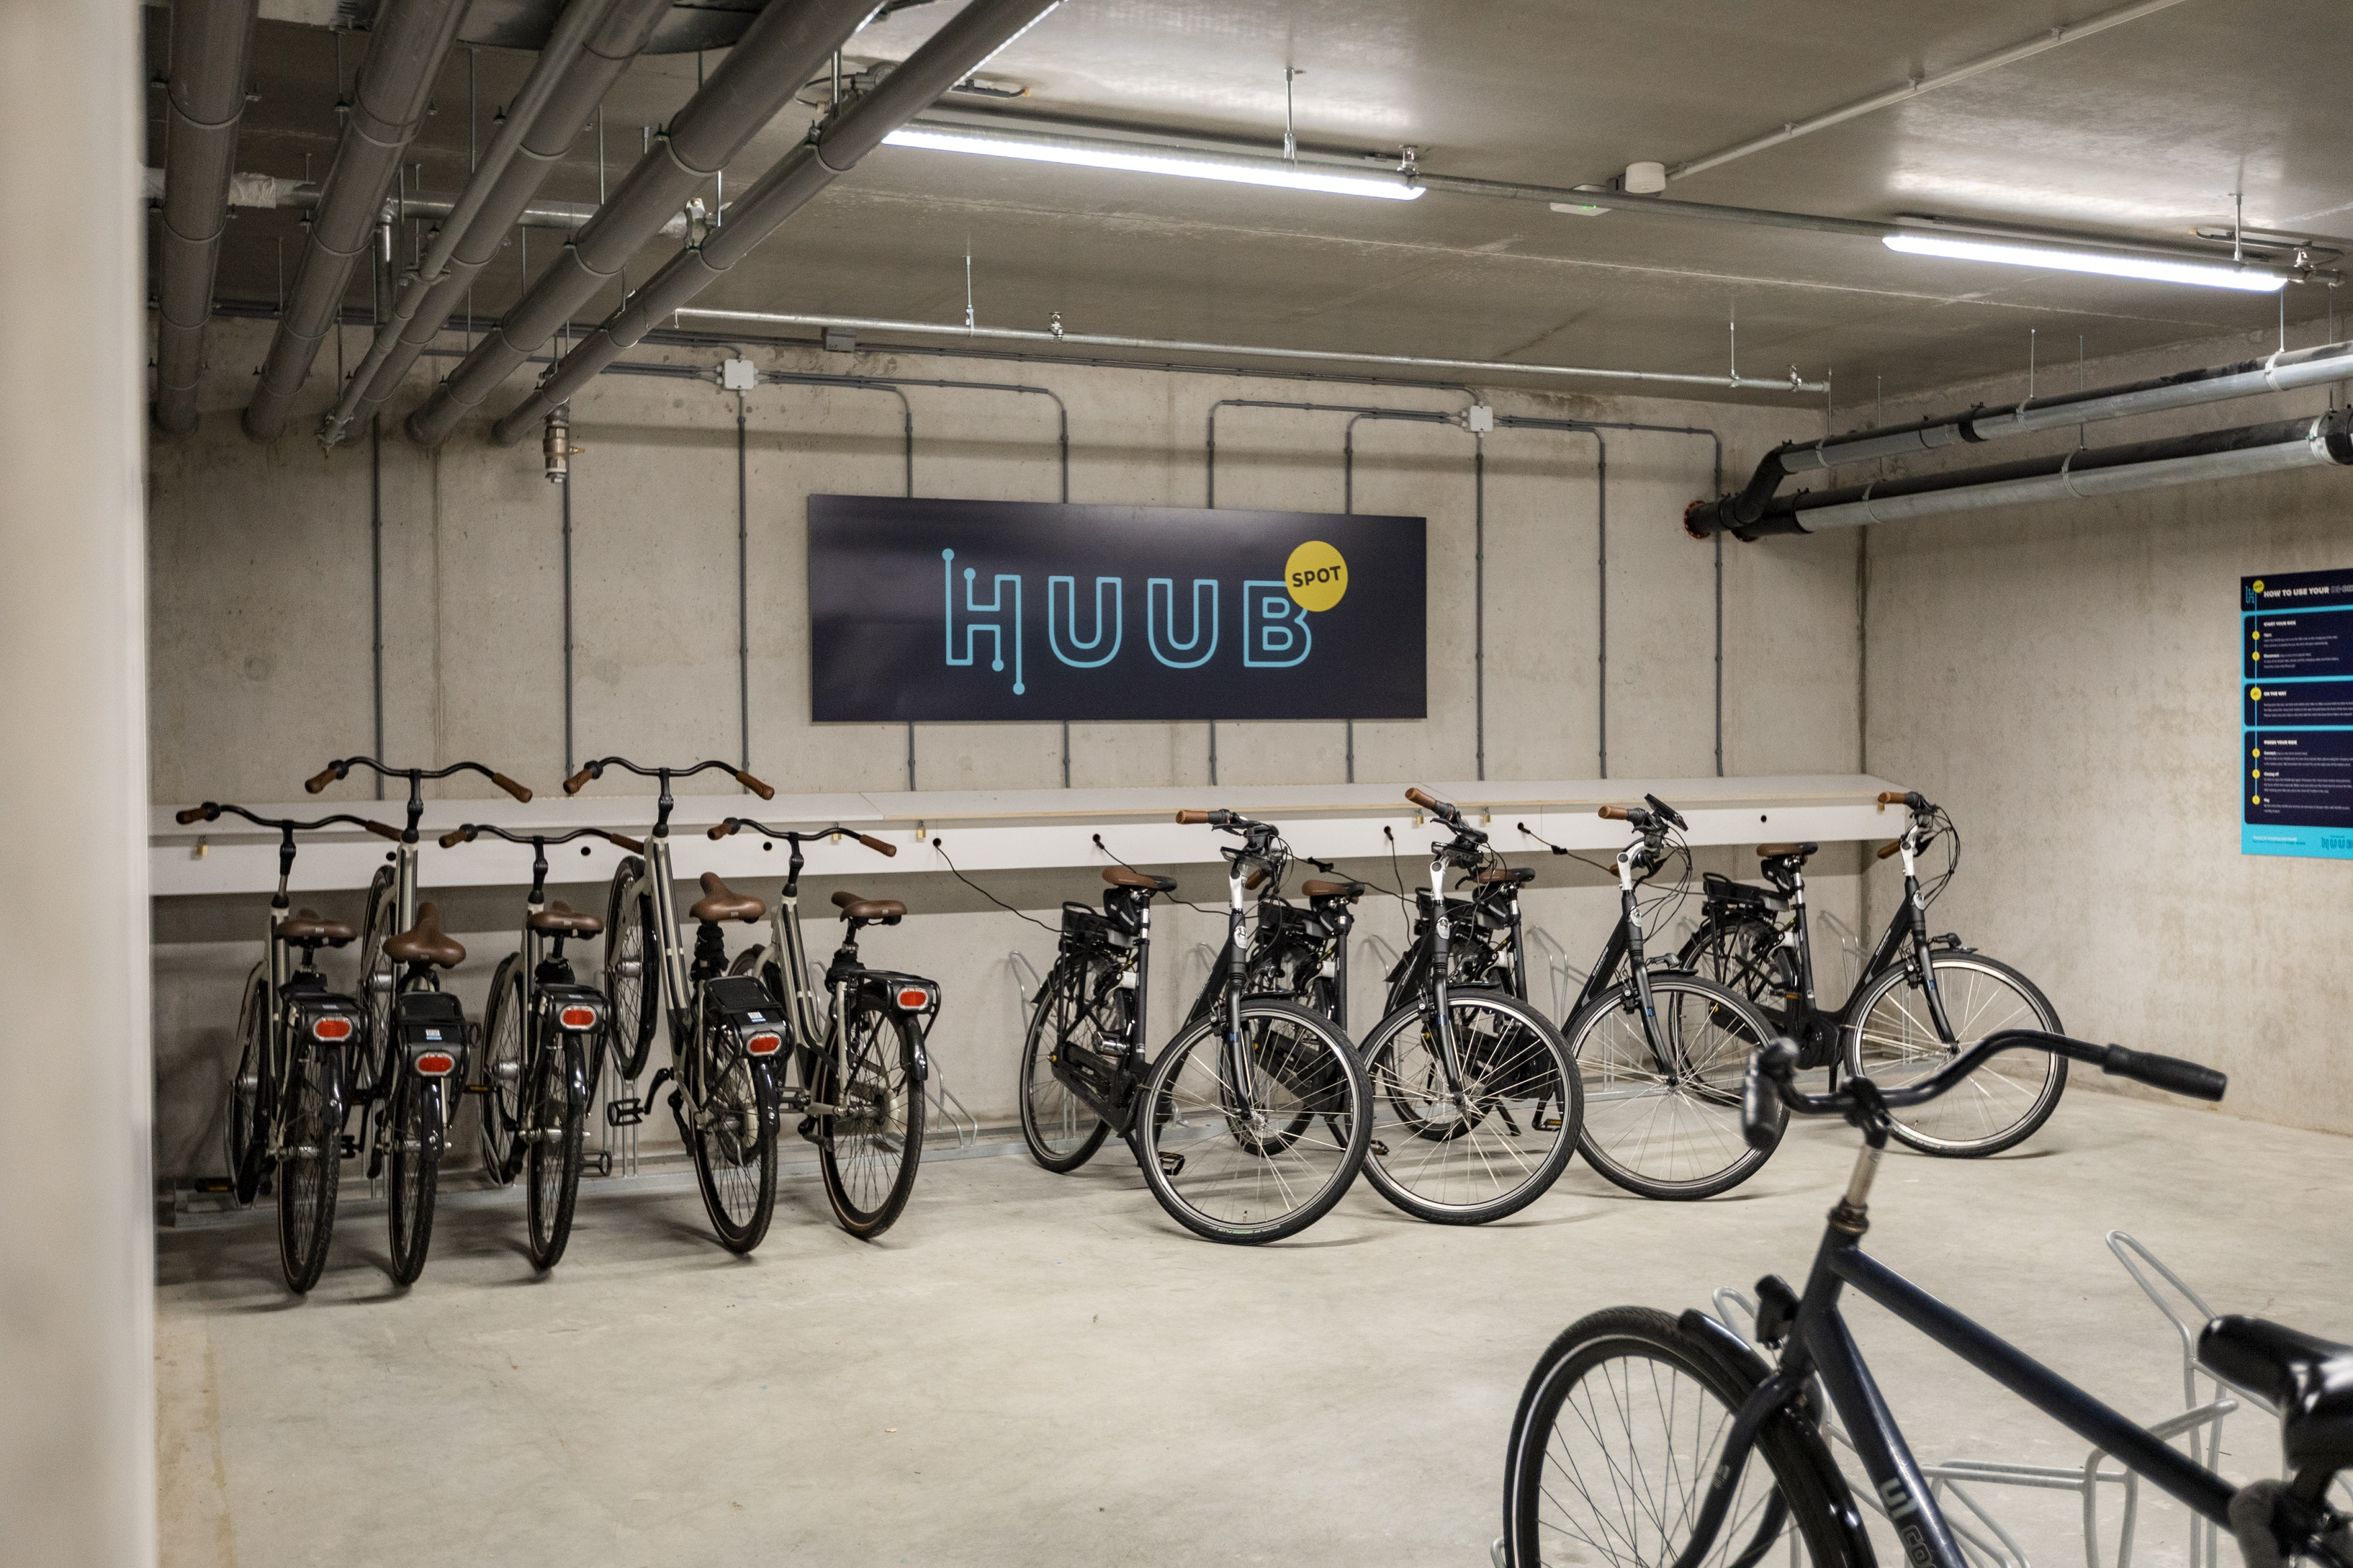 HUUB Bike rental service at OurDomain Amsterdam Diemen